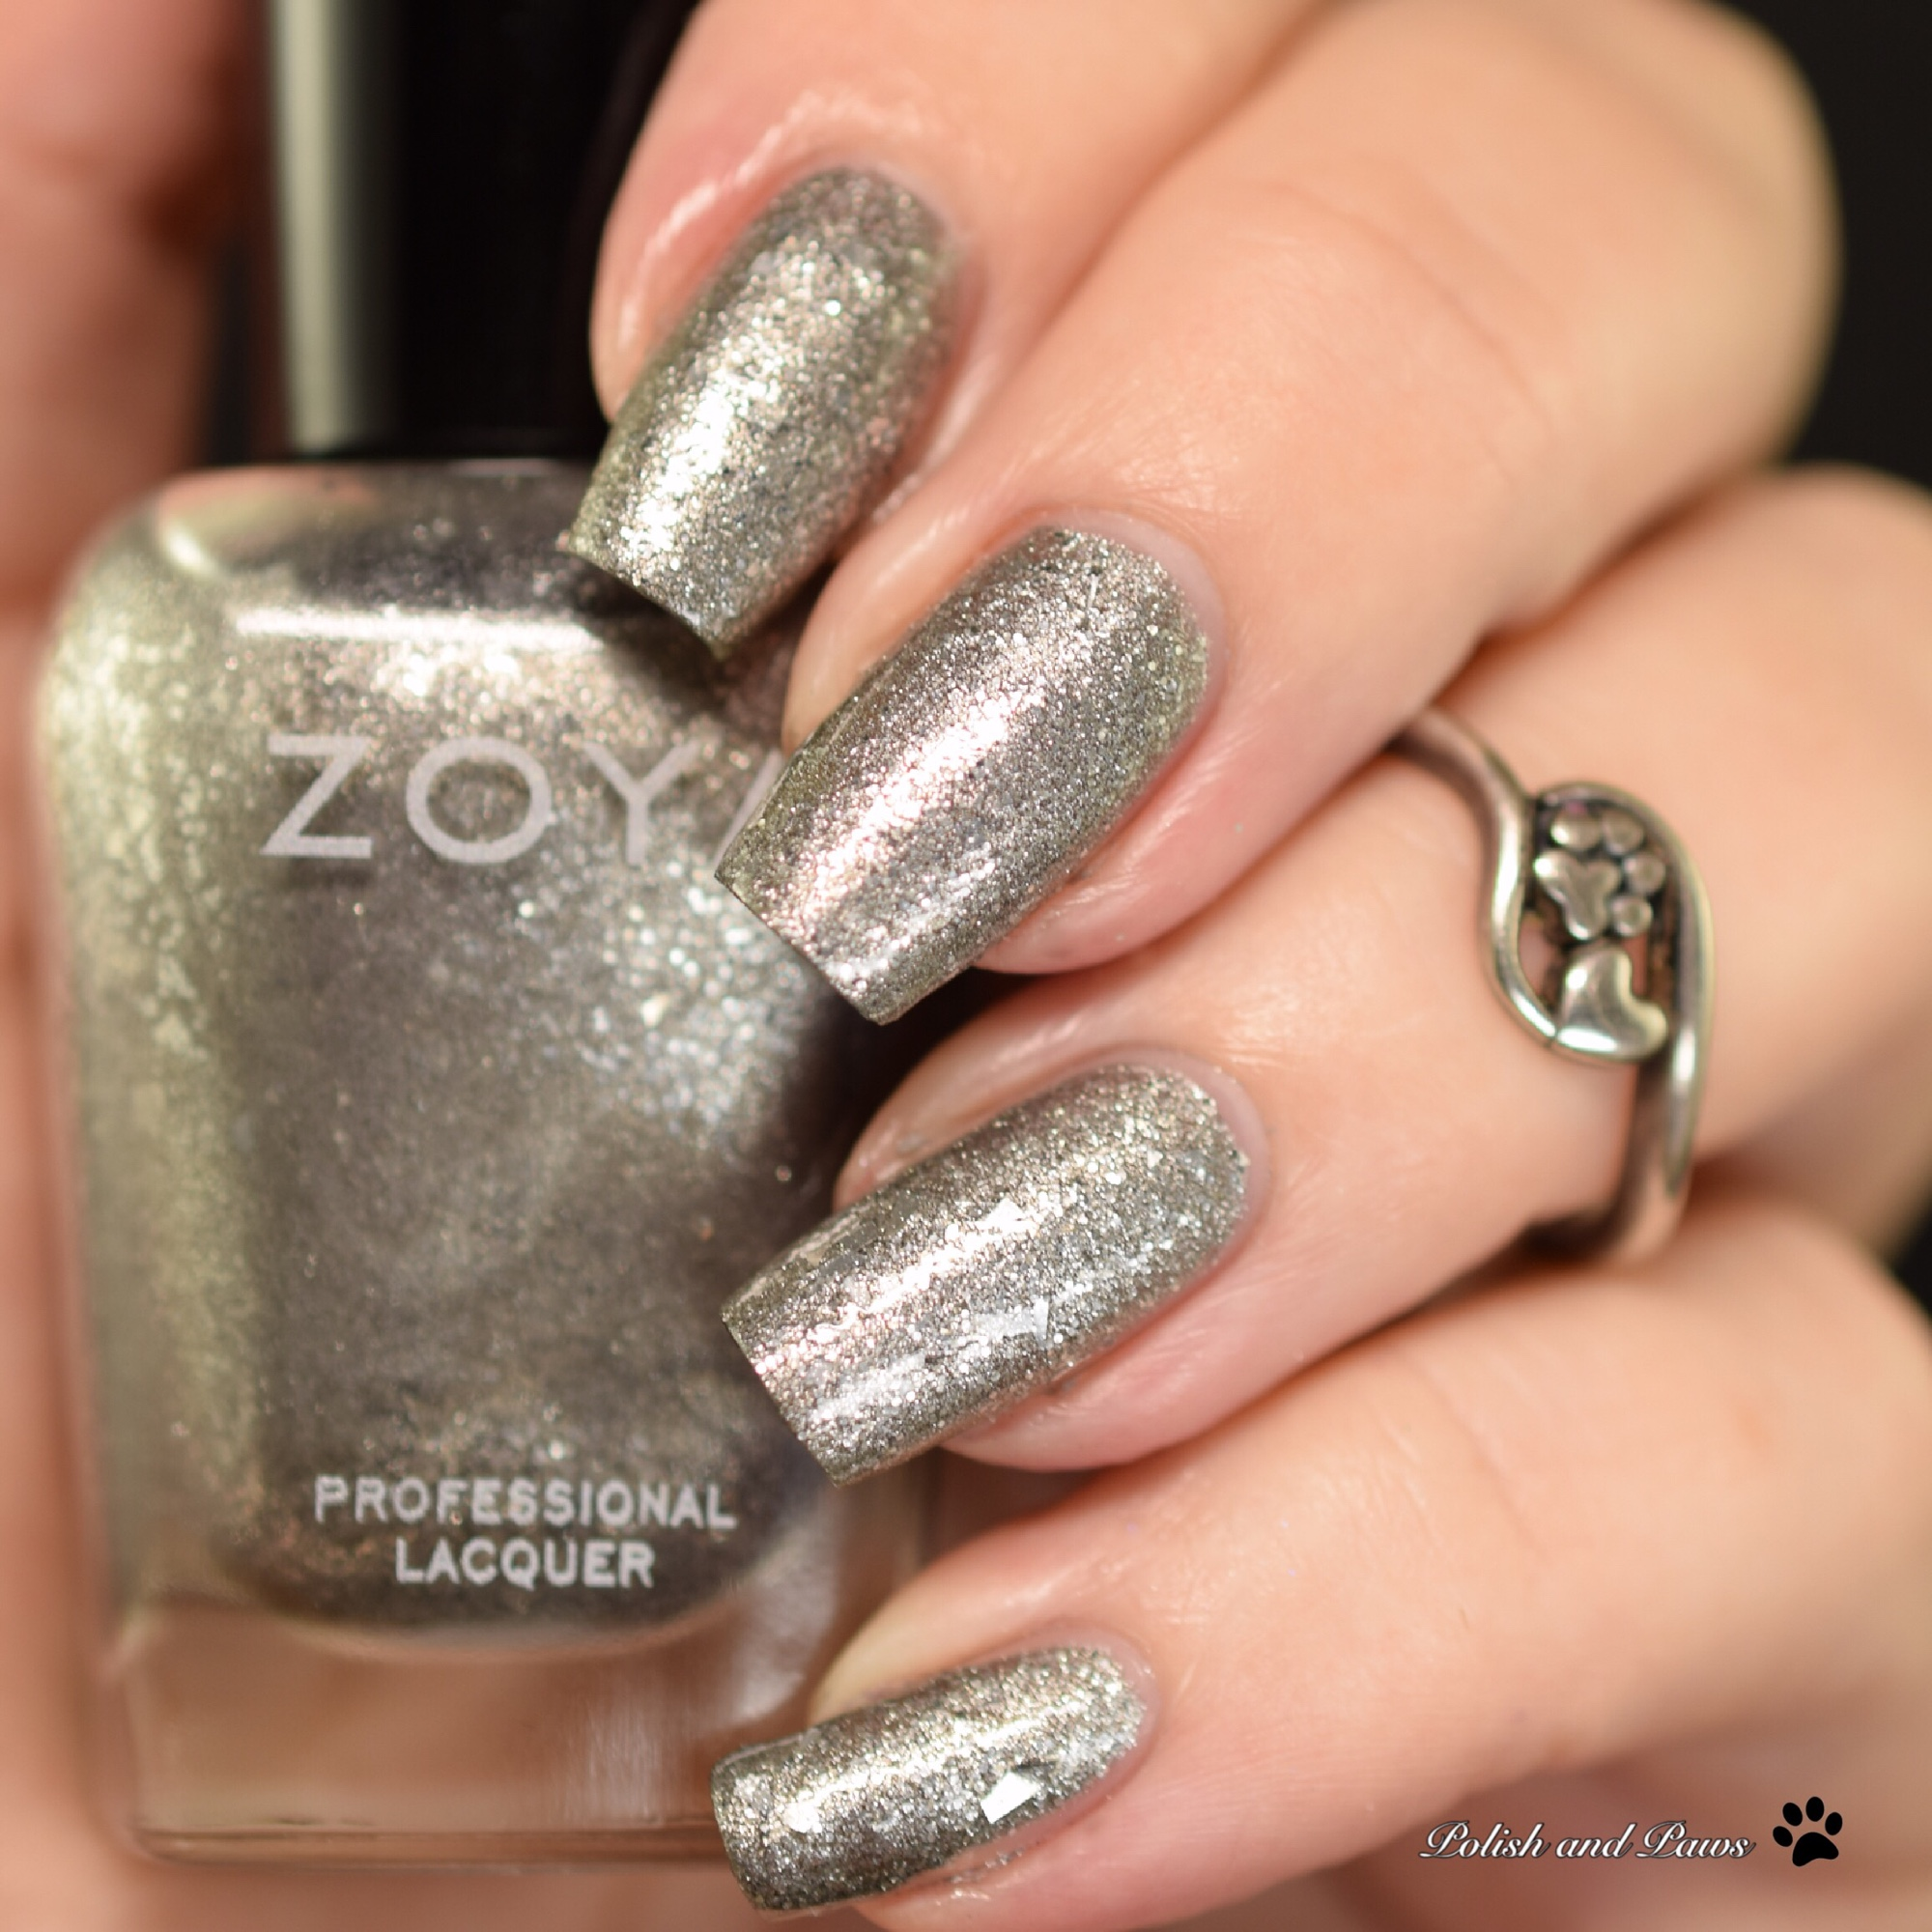 Zoya Nail Polish Jett